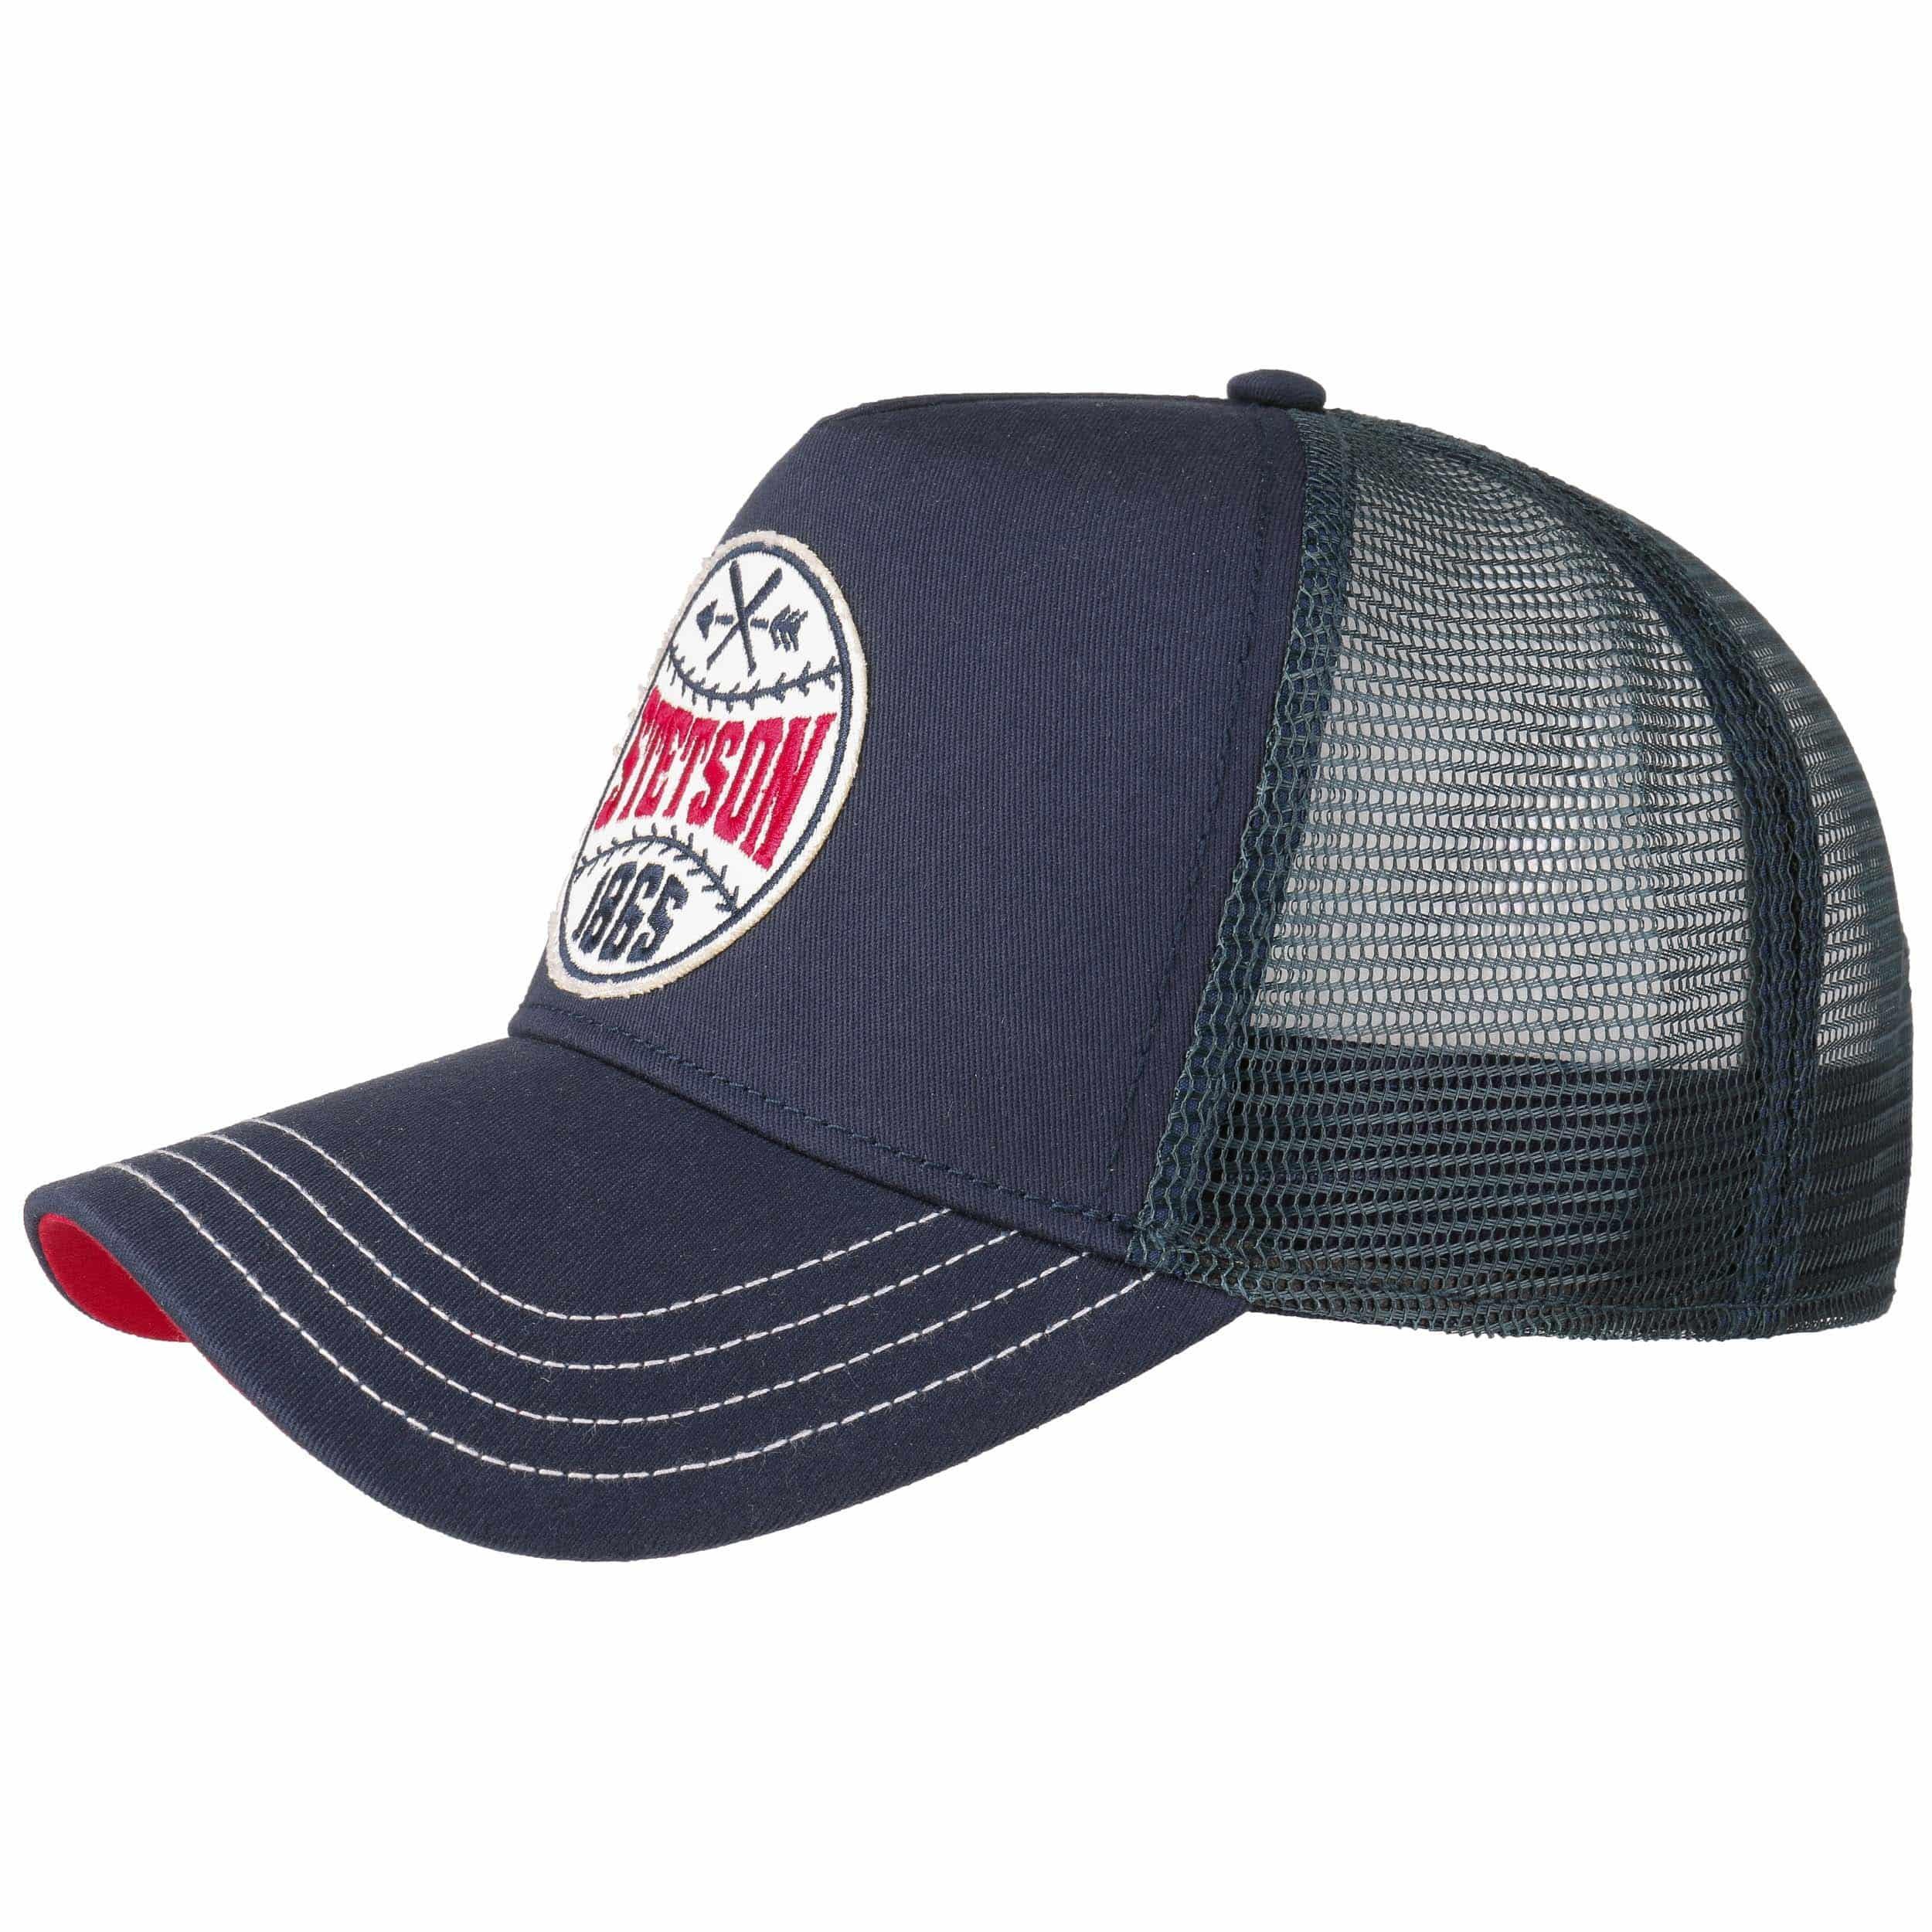 SDFS83 Saint-Barthelemy Adult Cowboy Hat Baseball Cap Adjustable Athletic Make Custom New Hat For Men and Women